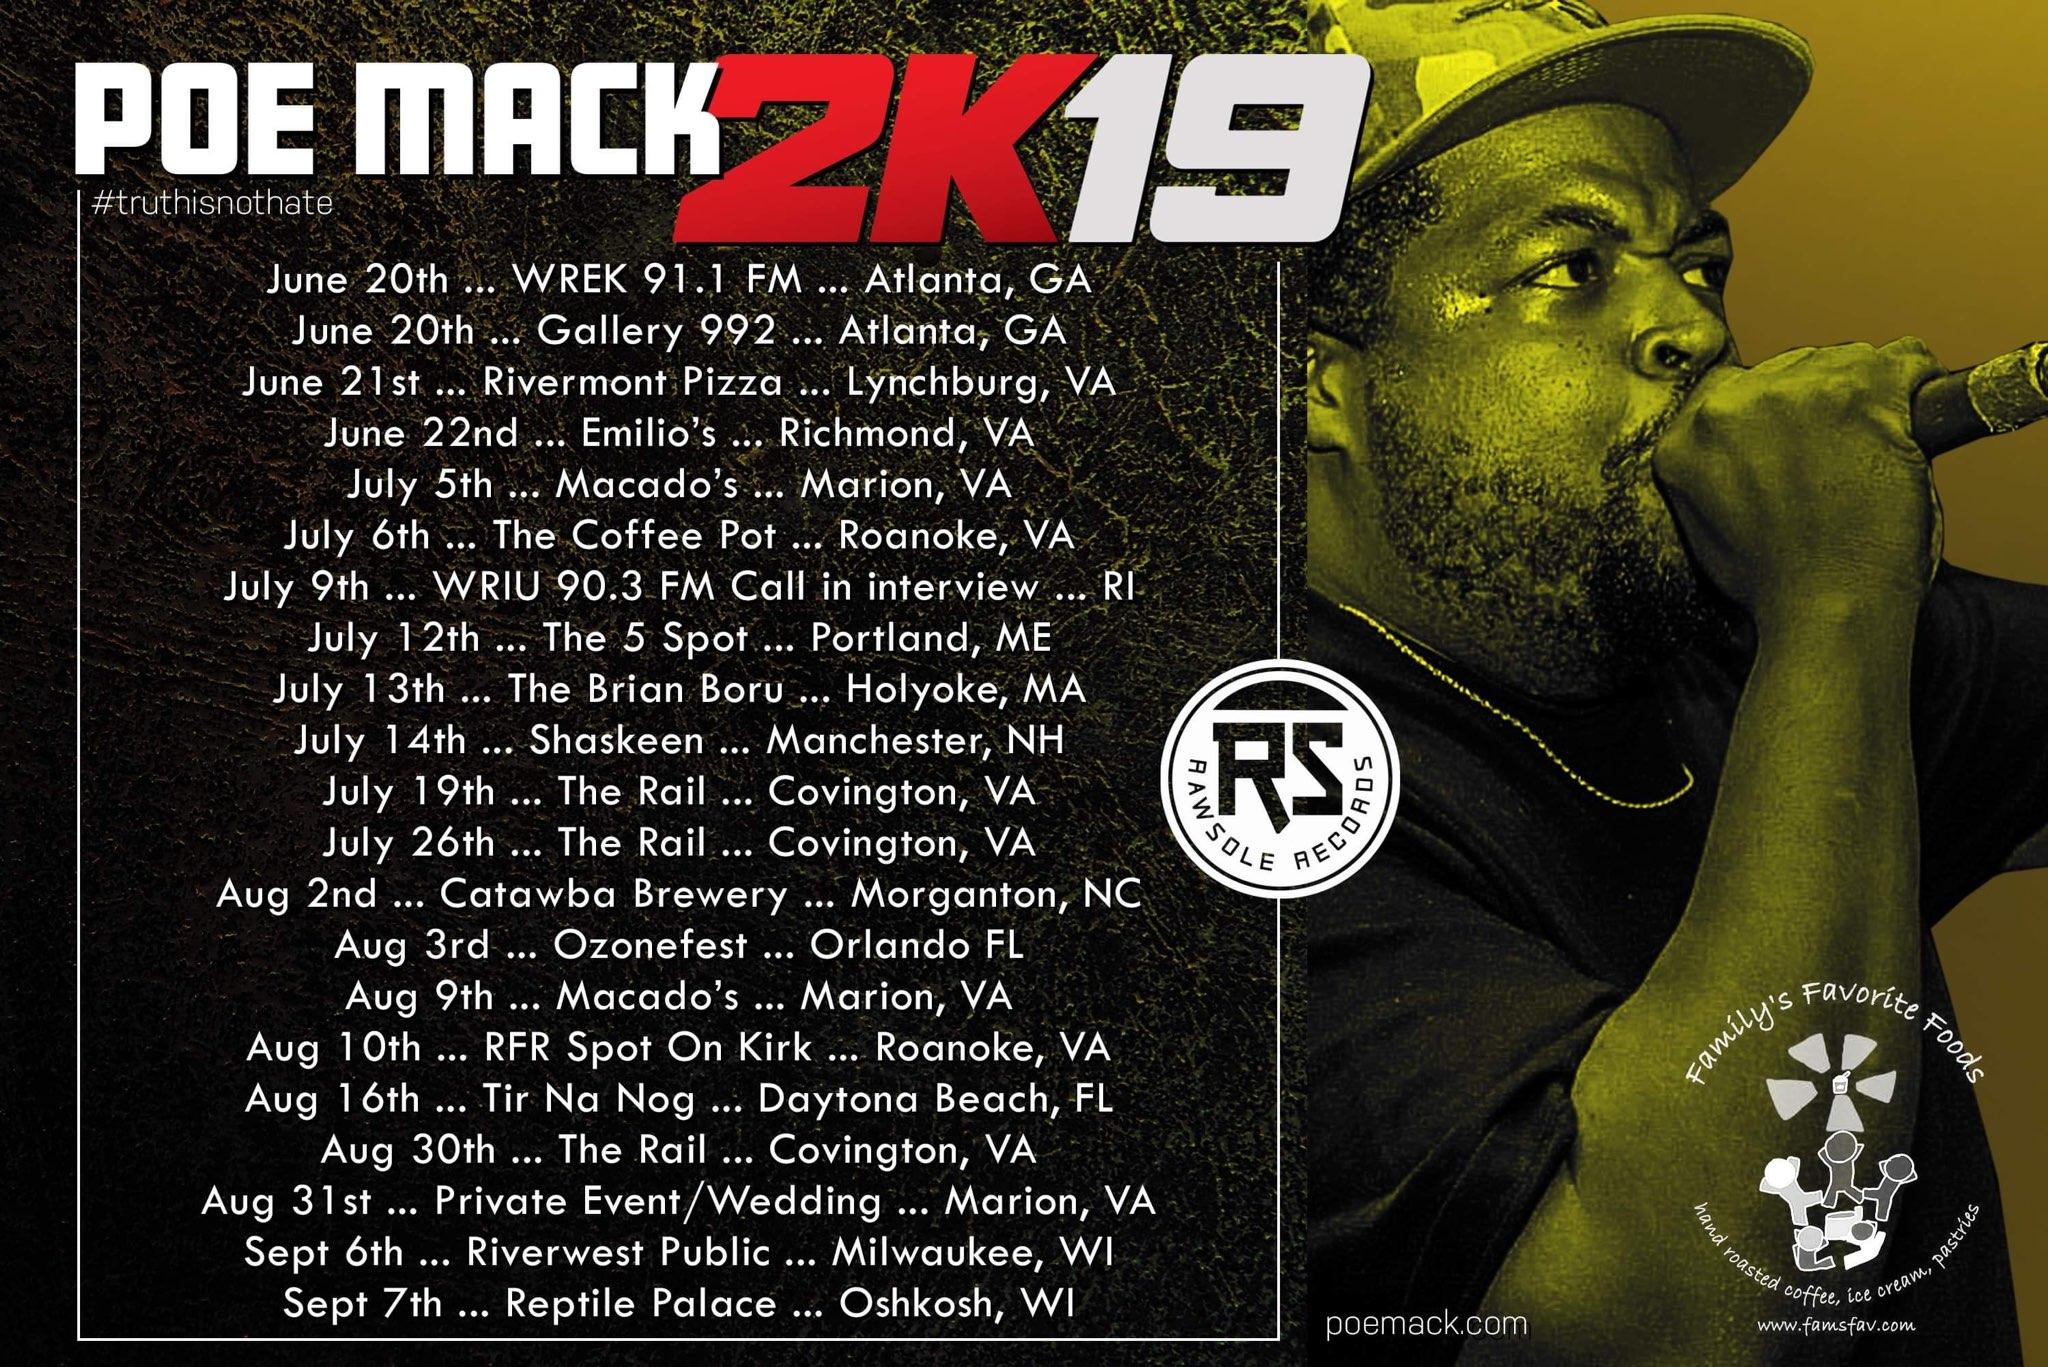 Poe Mack 2K19 Tour sponsored by Family's Favorite Foods